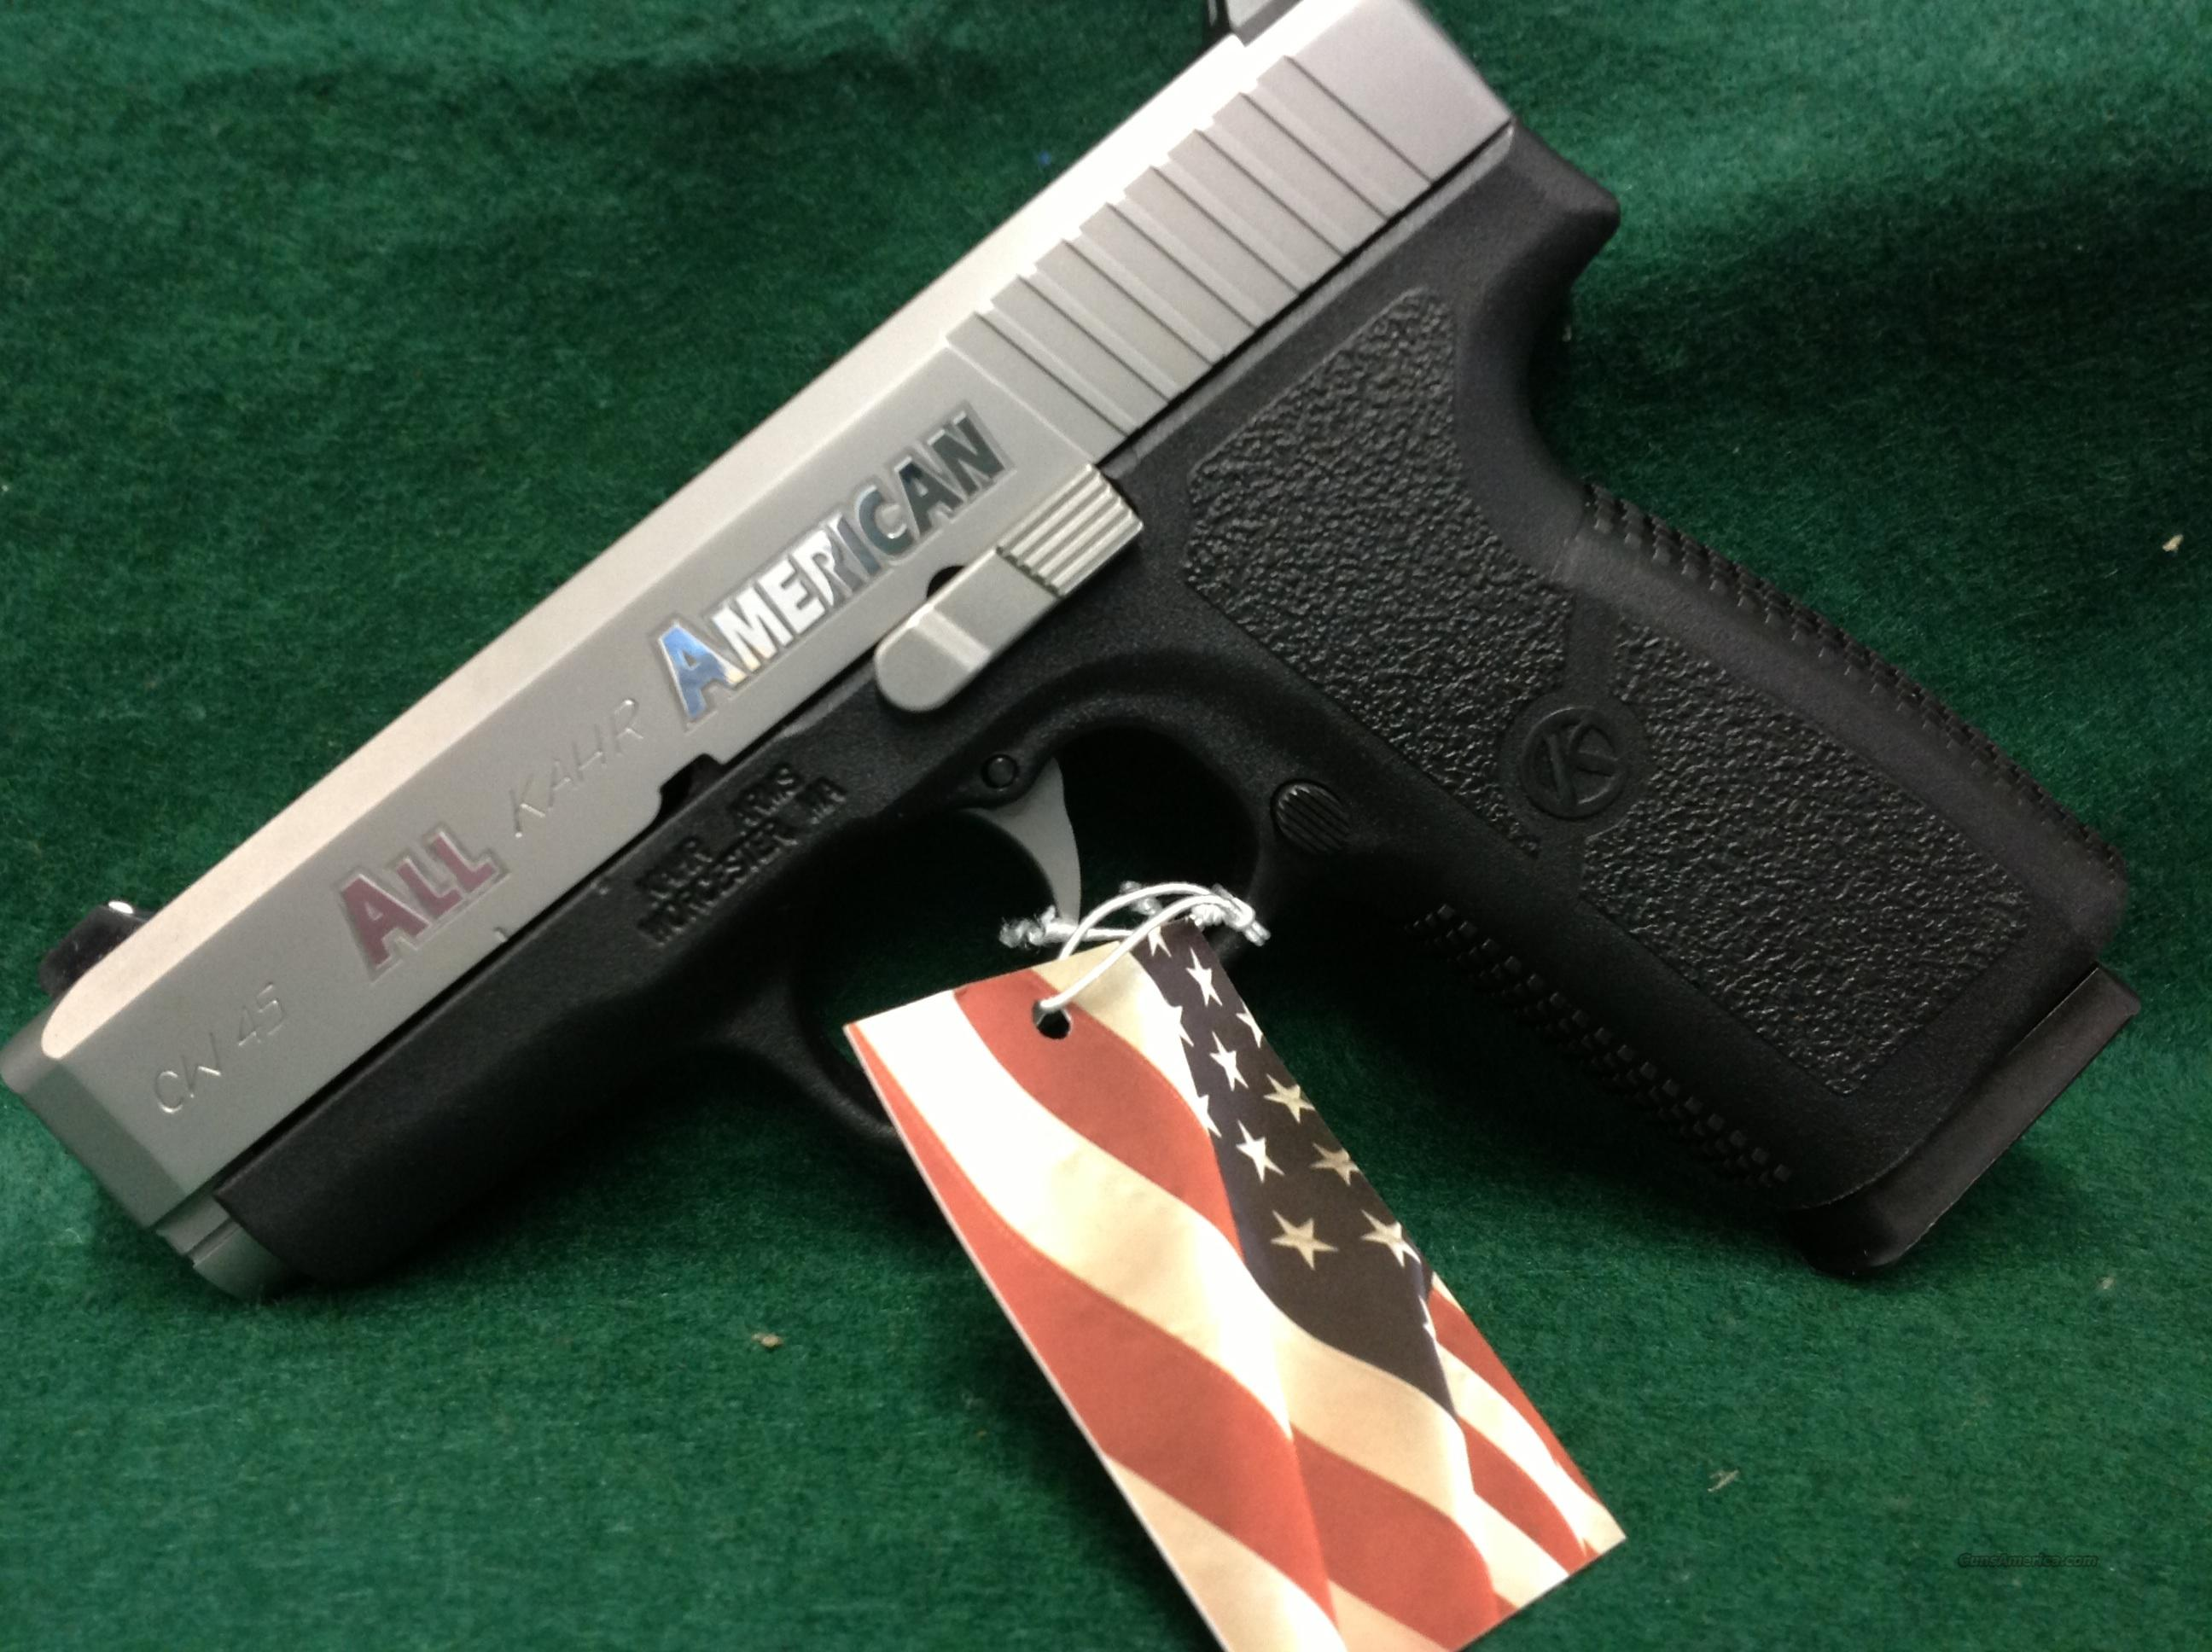 Kahr Arms CW45 All American   Guns > Pistols > Kahr Pistols